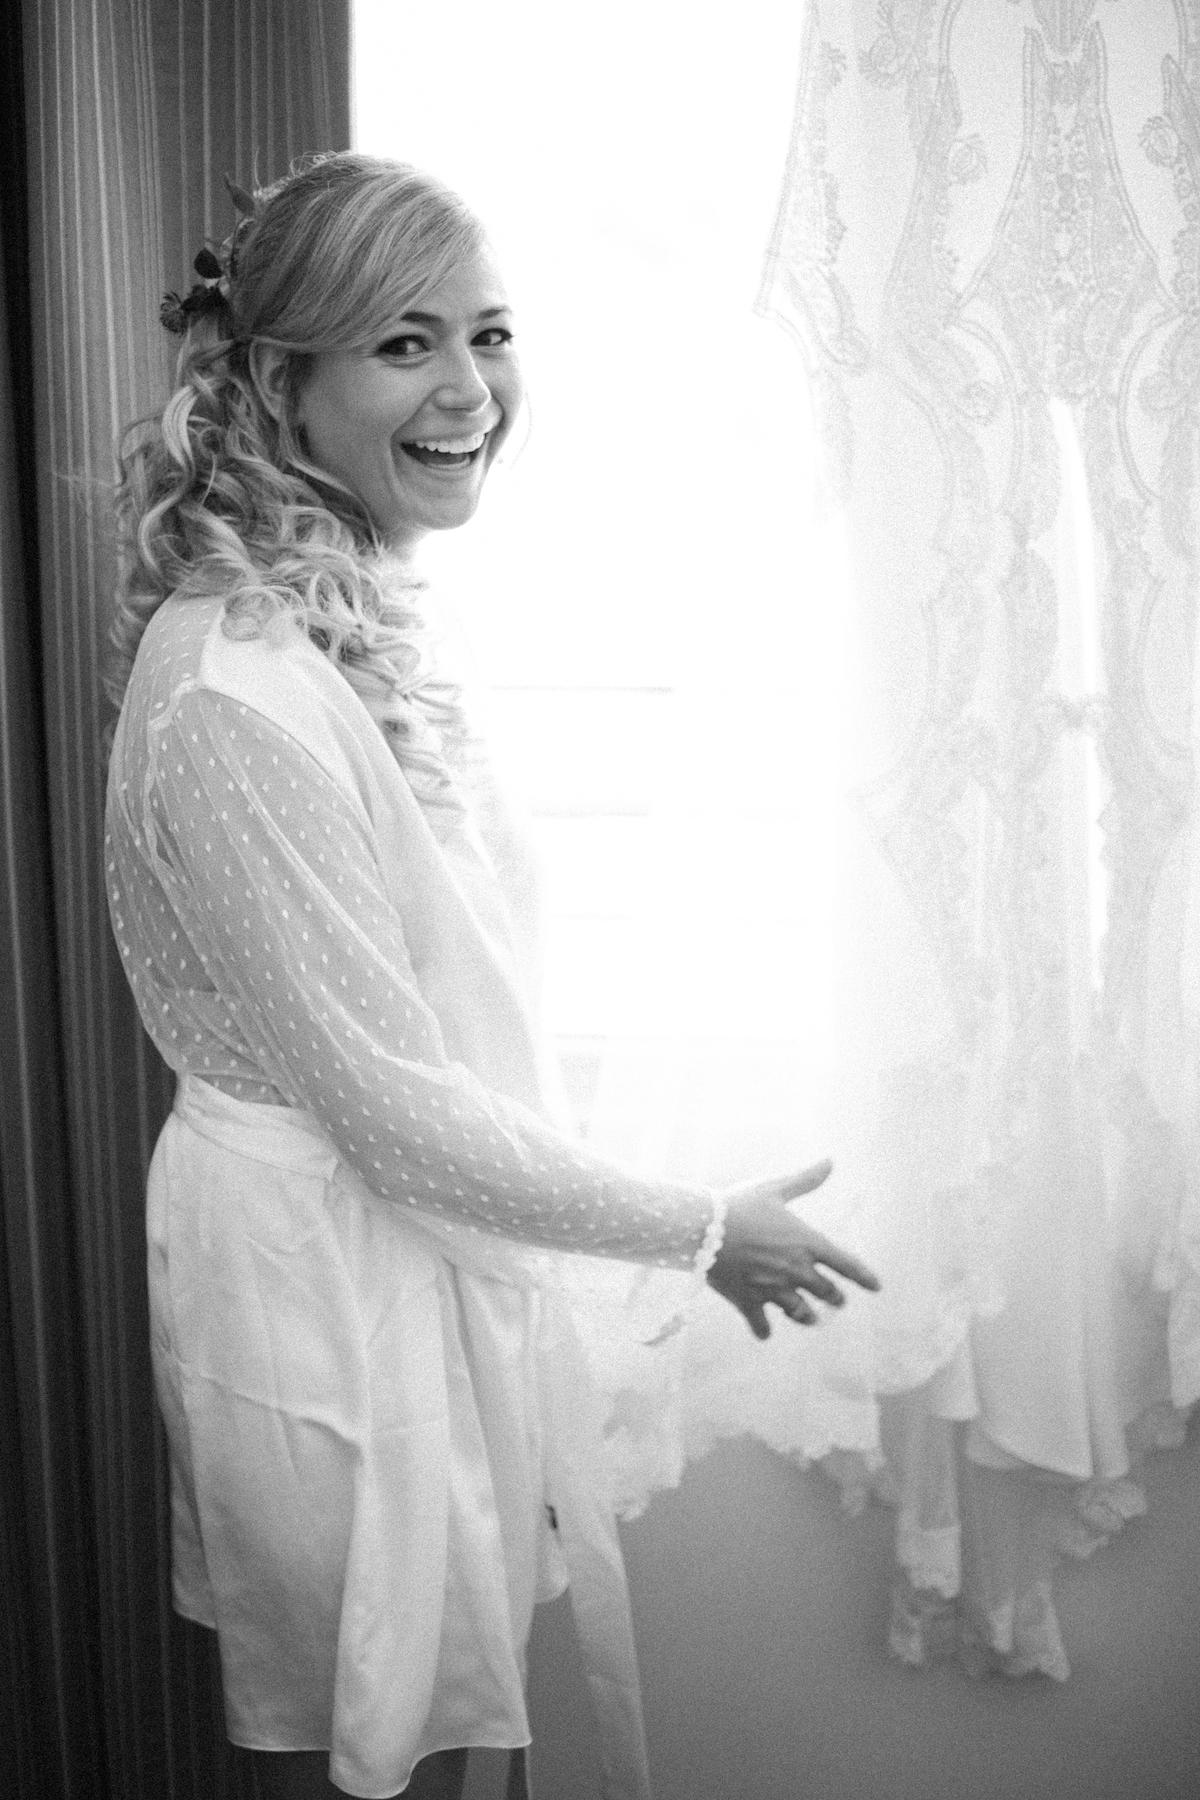 annecy-wedding-photos-70.jpg